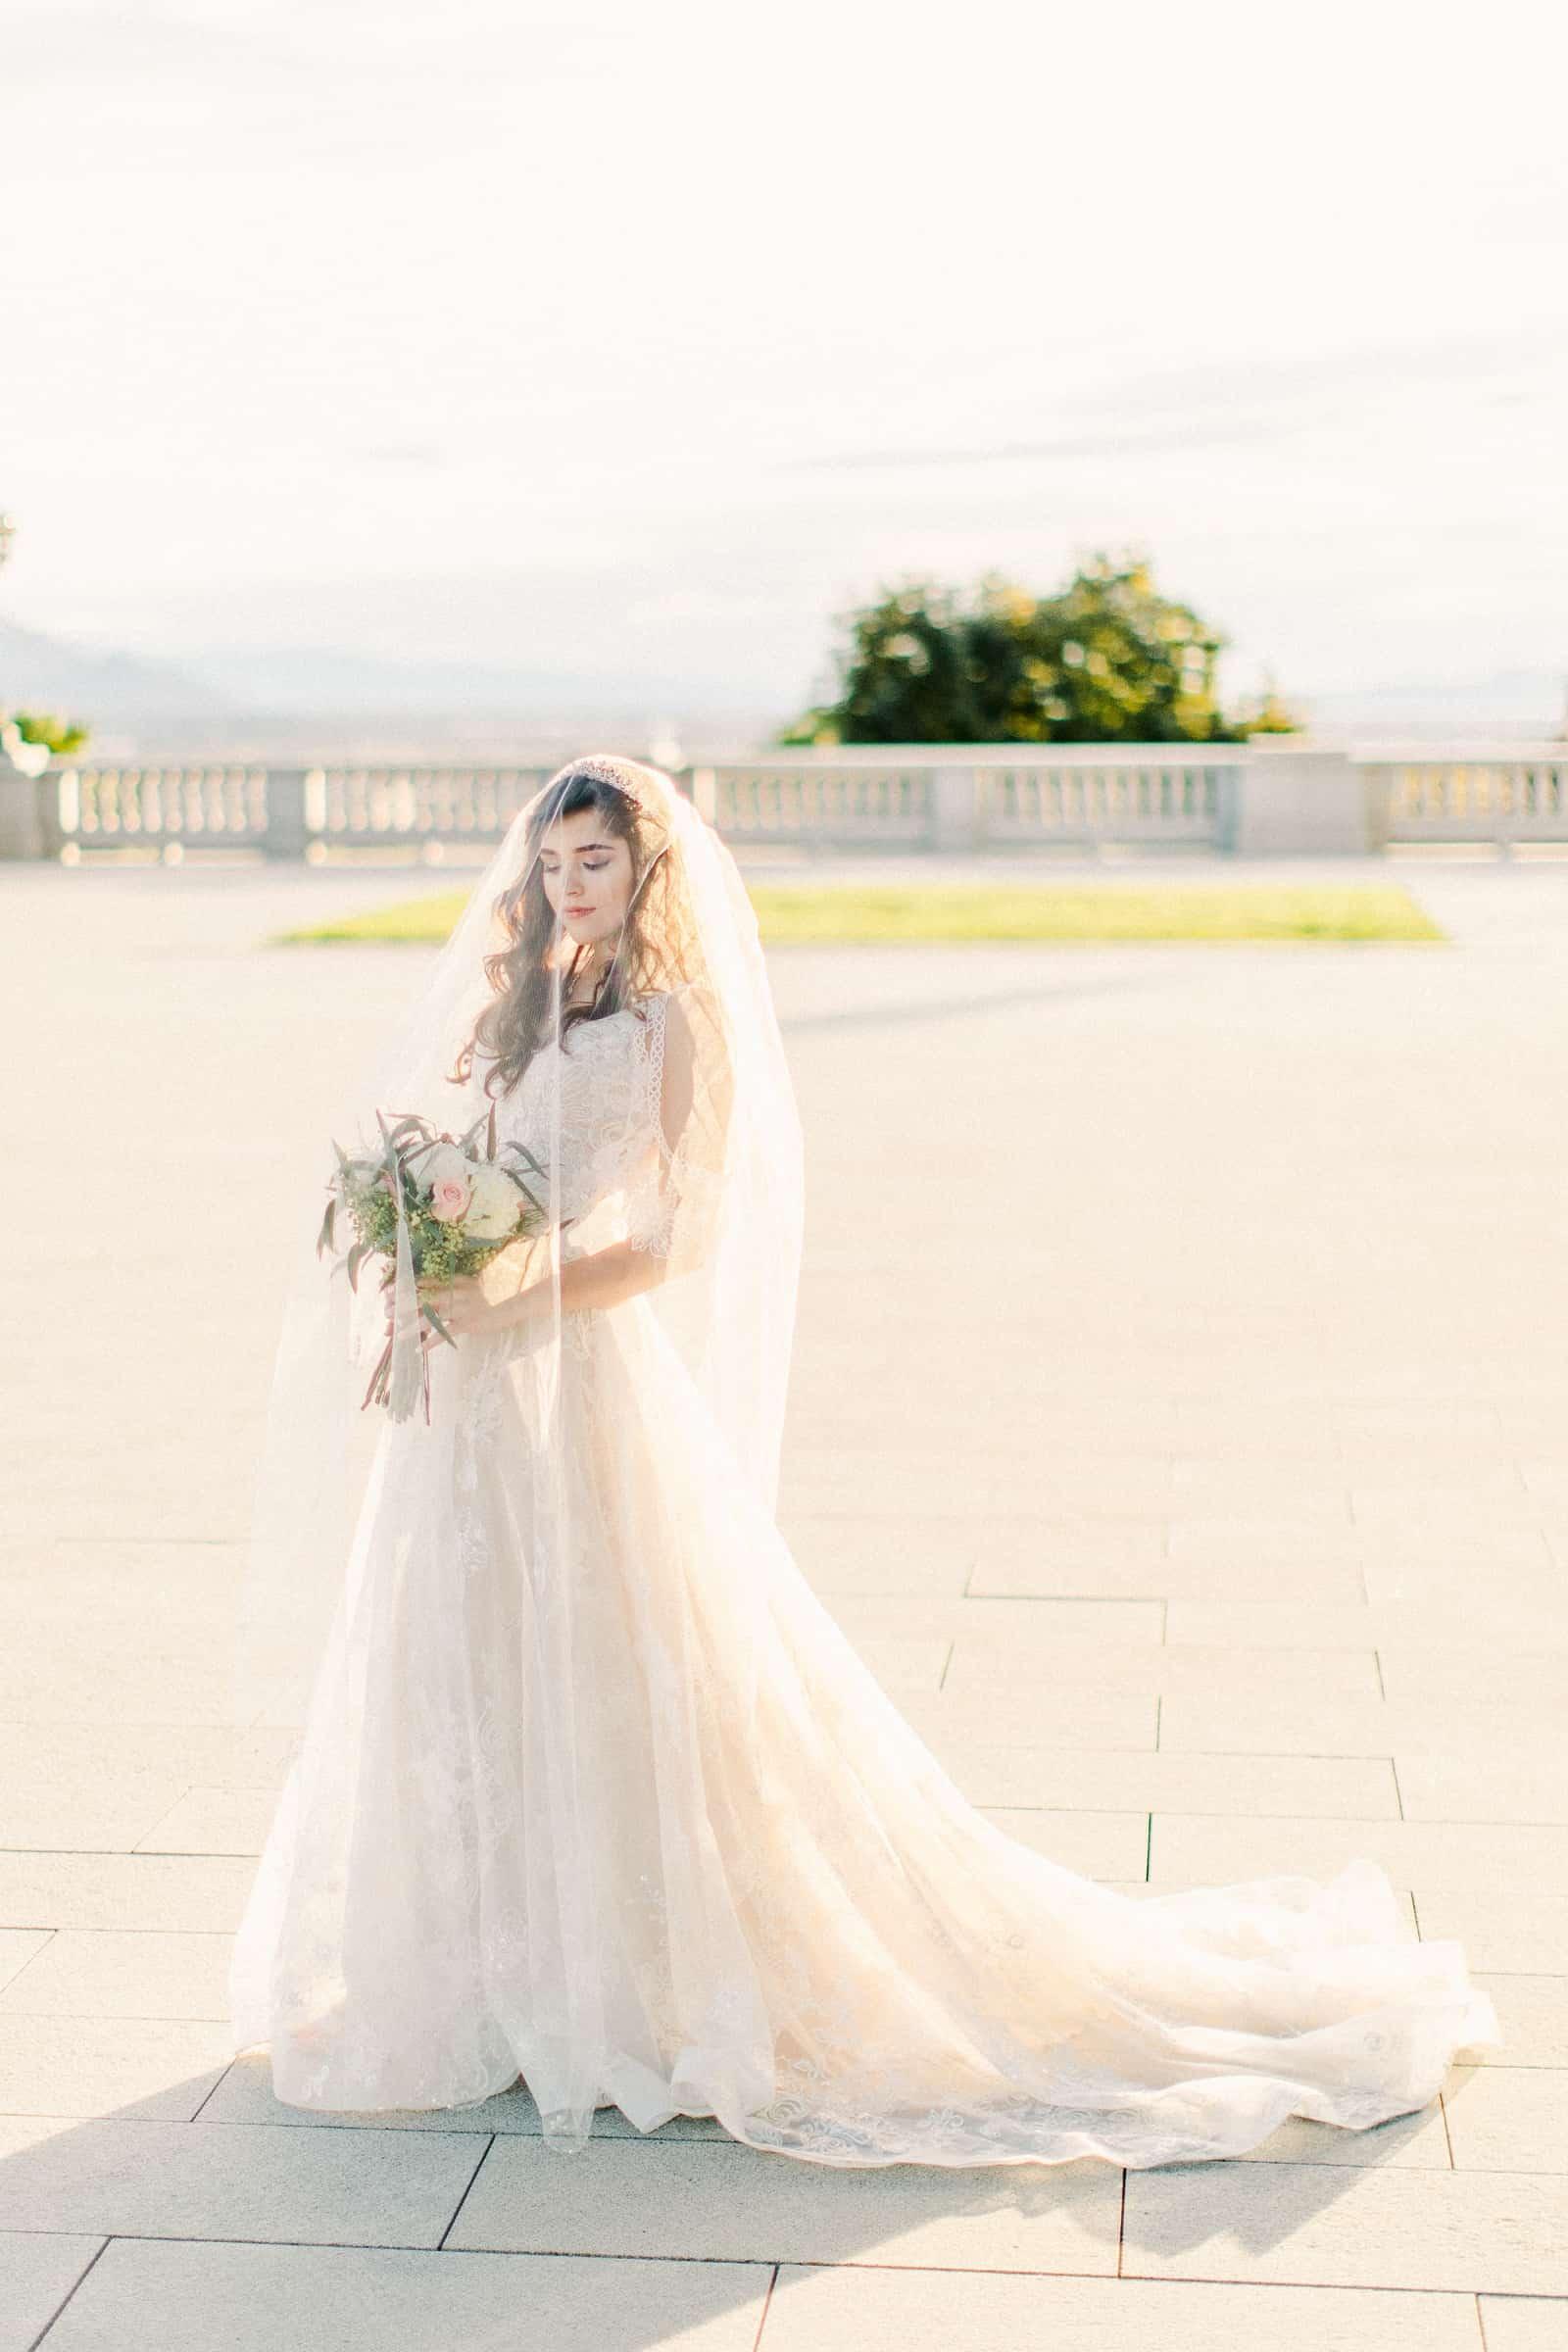 Palestinian Iranian Bride and Groom, Utah Wedding Photography at the Utah State Capitol, beautiful bride boho lace wedding dress sunset light